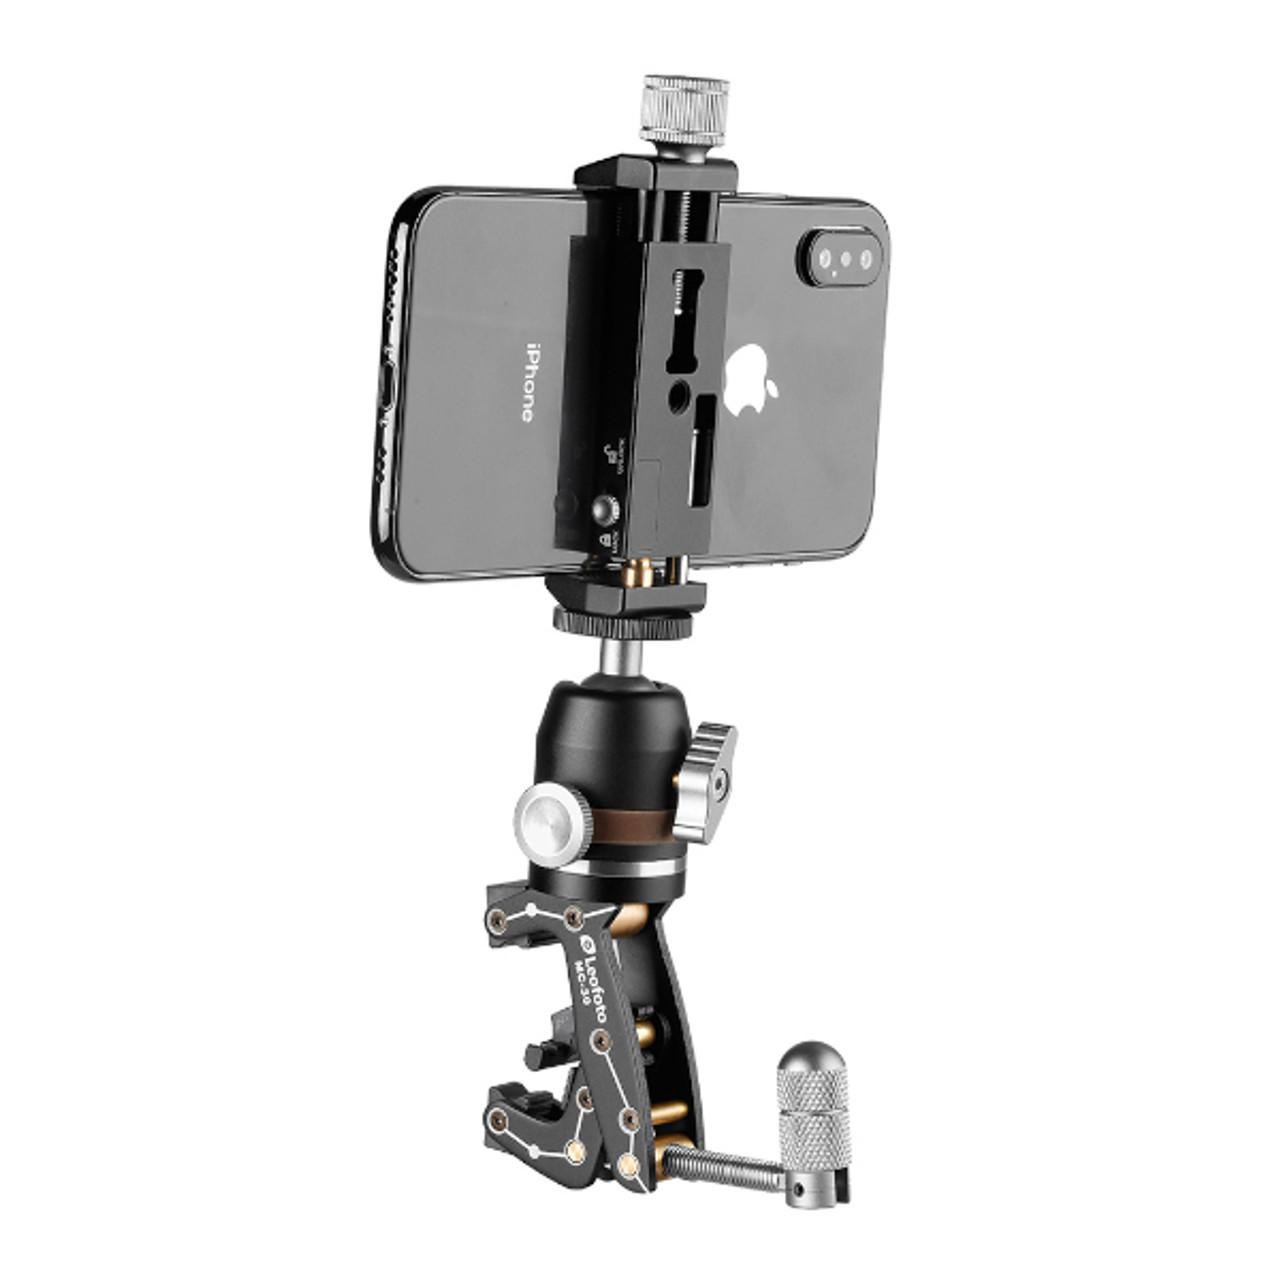 Leofoto MC-30 Multipurpose Clamp Kit (w/ MBH-19 Micro Ball Head & PC-90 Smartphone Clamp)